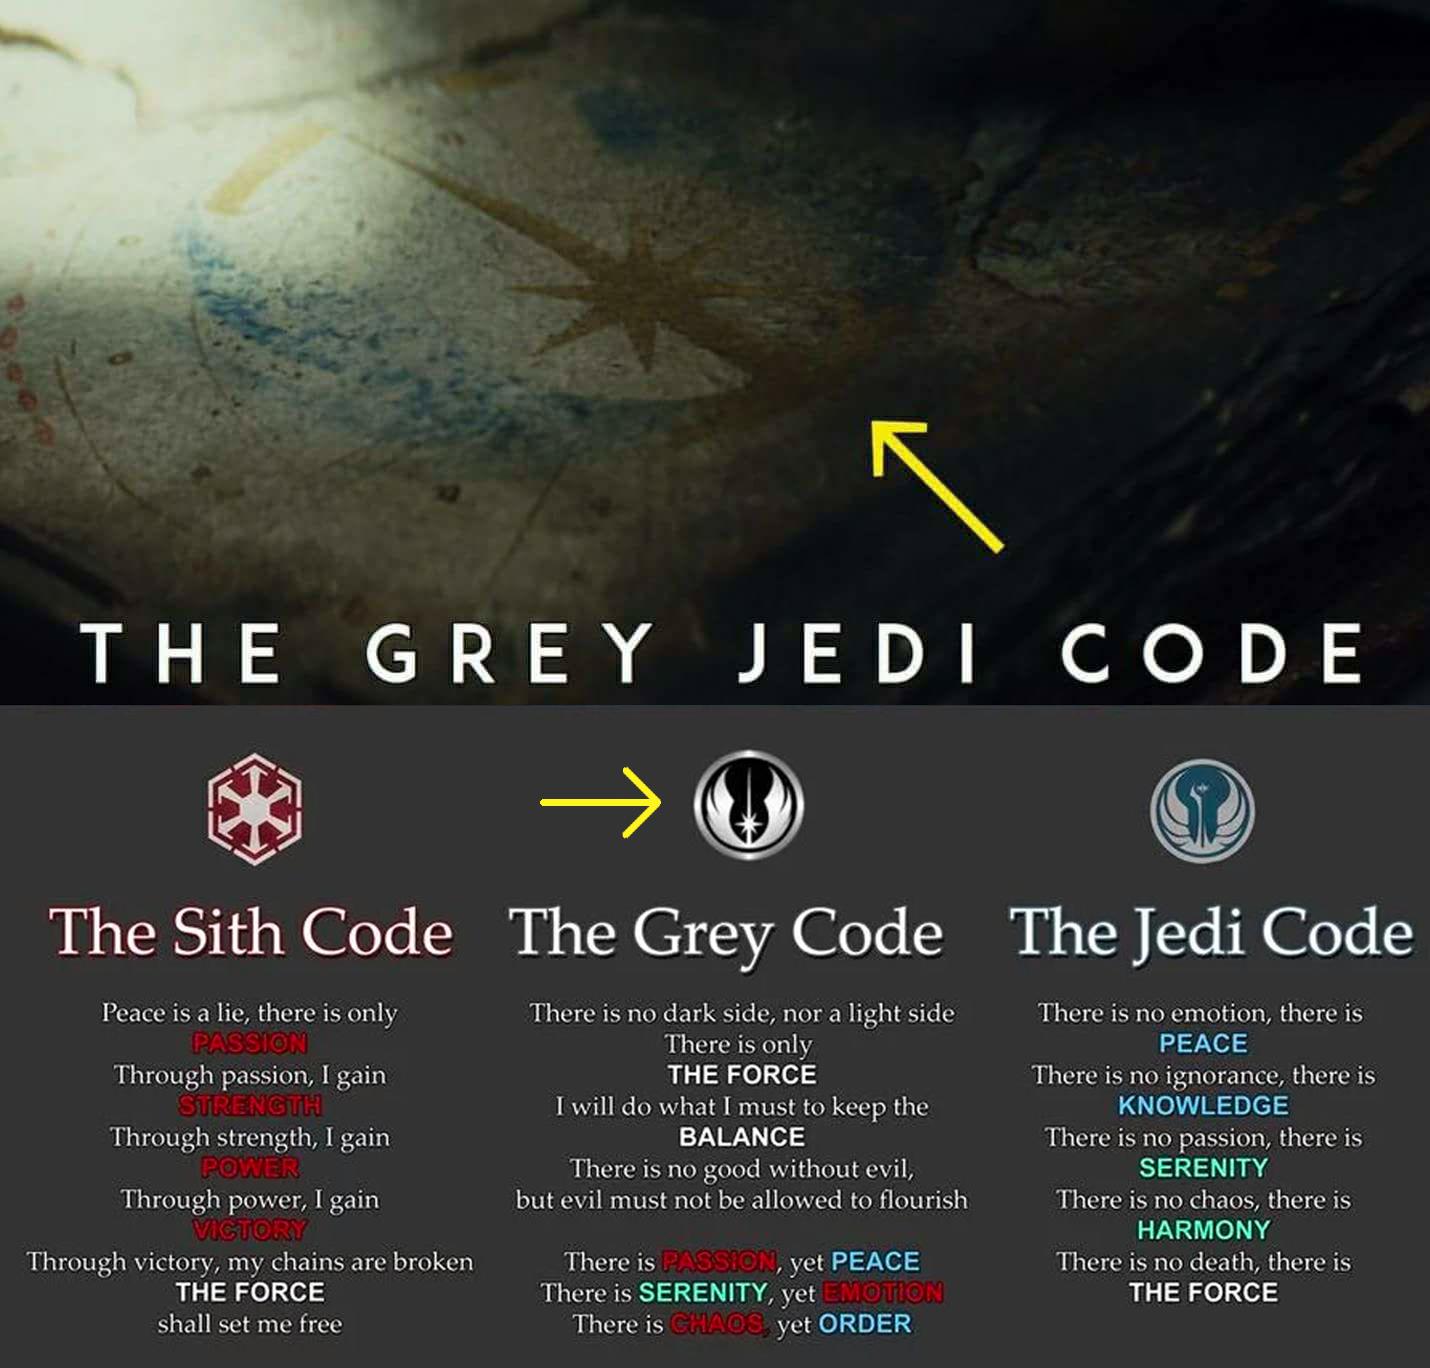 1492210378 Grey Jedi Code3 Png 1430 1368 Grey Jedi New Star Wars Star Wars Facts